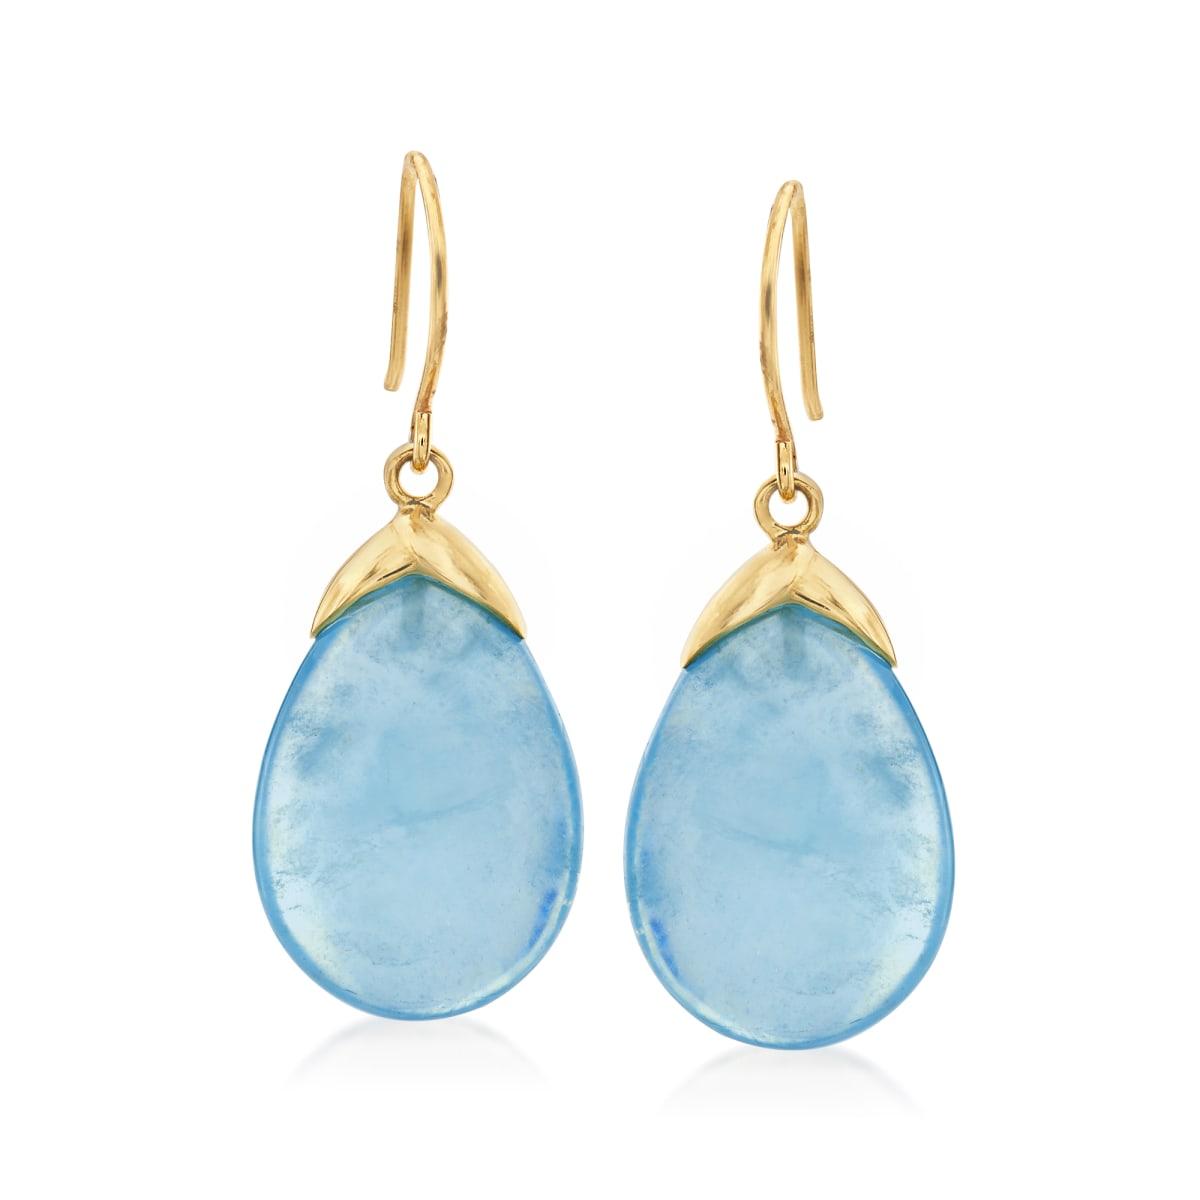 19.50 ct. t.w. Aquamarine Drop Earrings in 14kt Yellow Gold | Ross-Simons